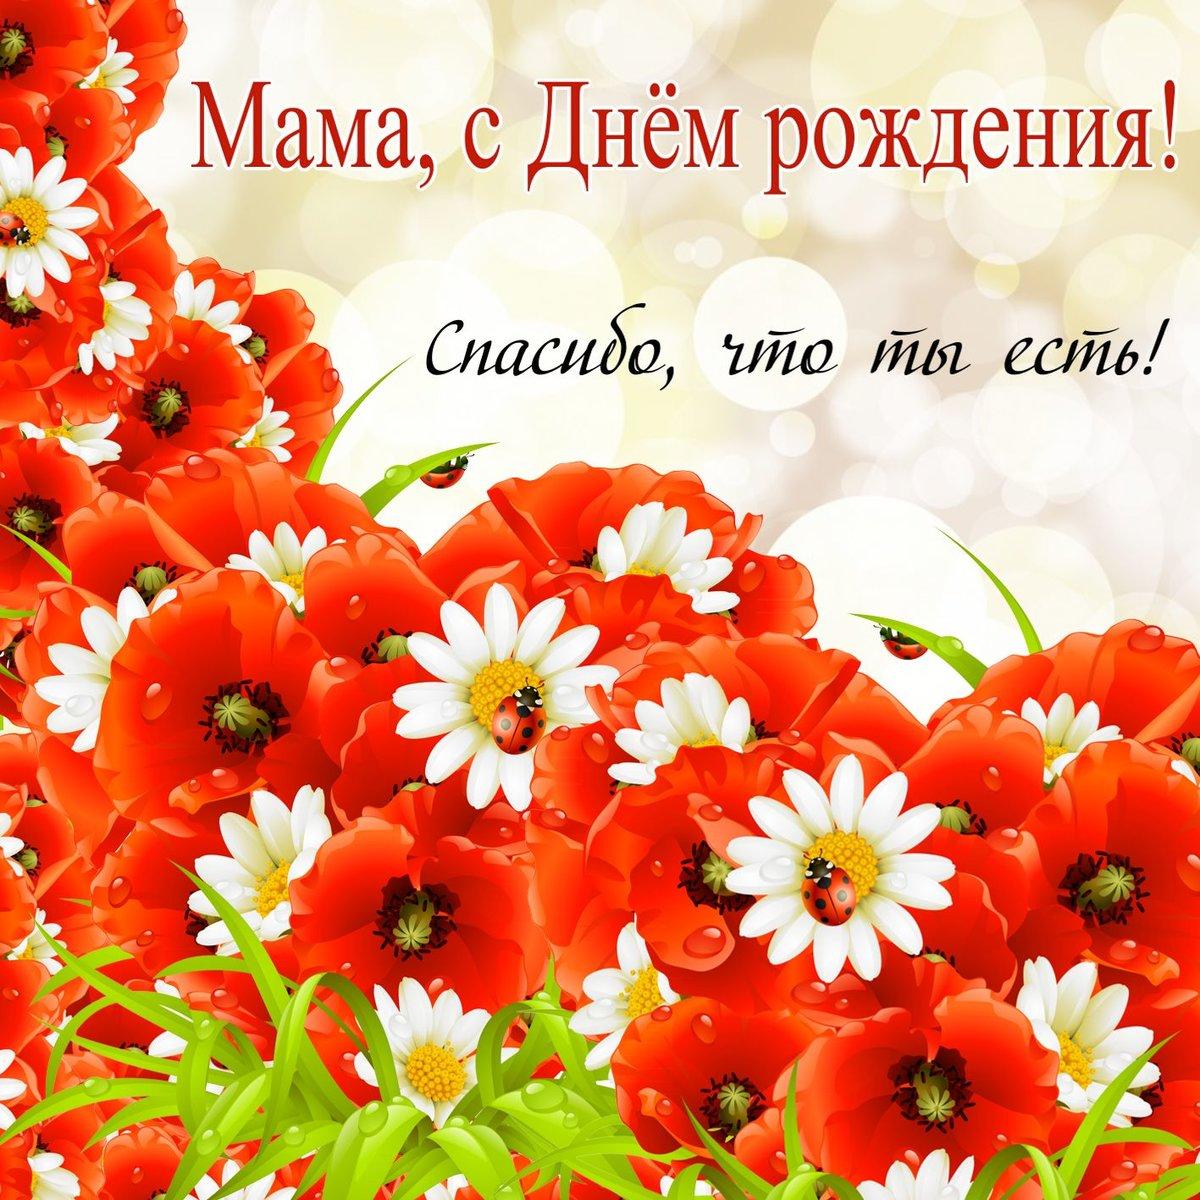 Картинка цветы открытка маме, позитива картинки степанова